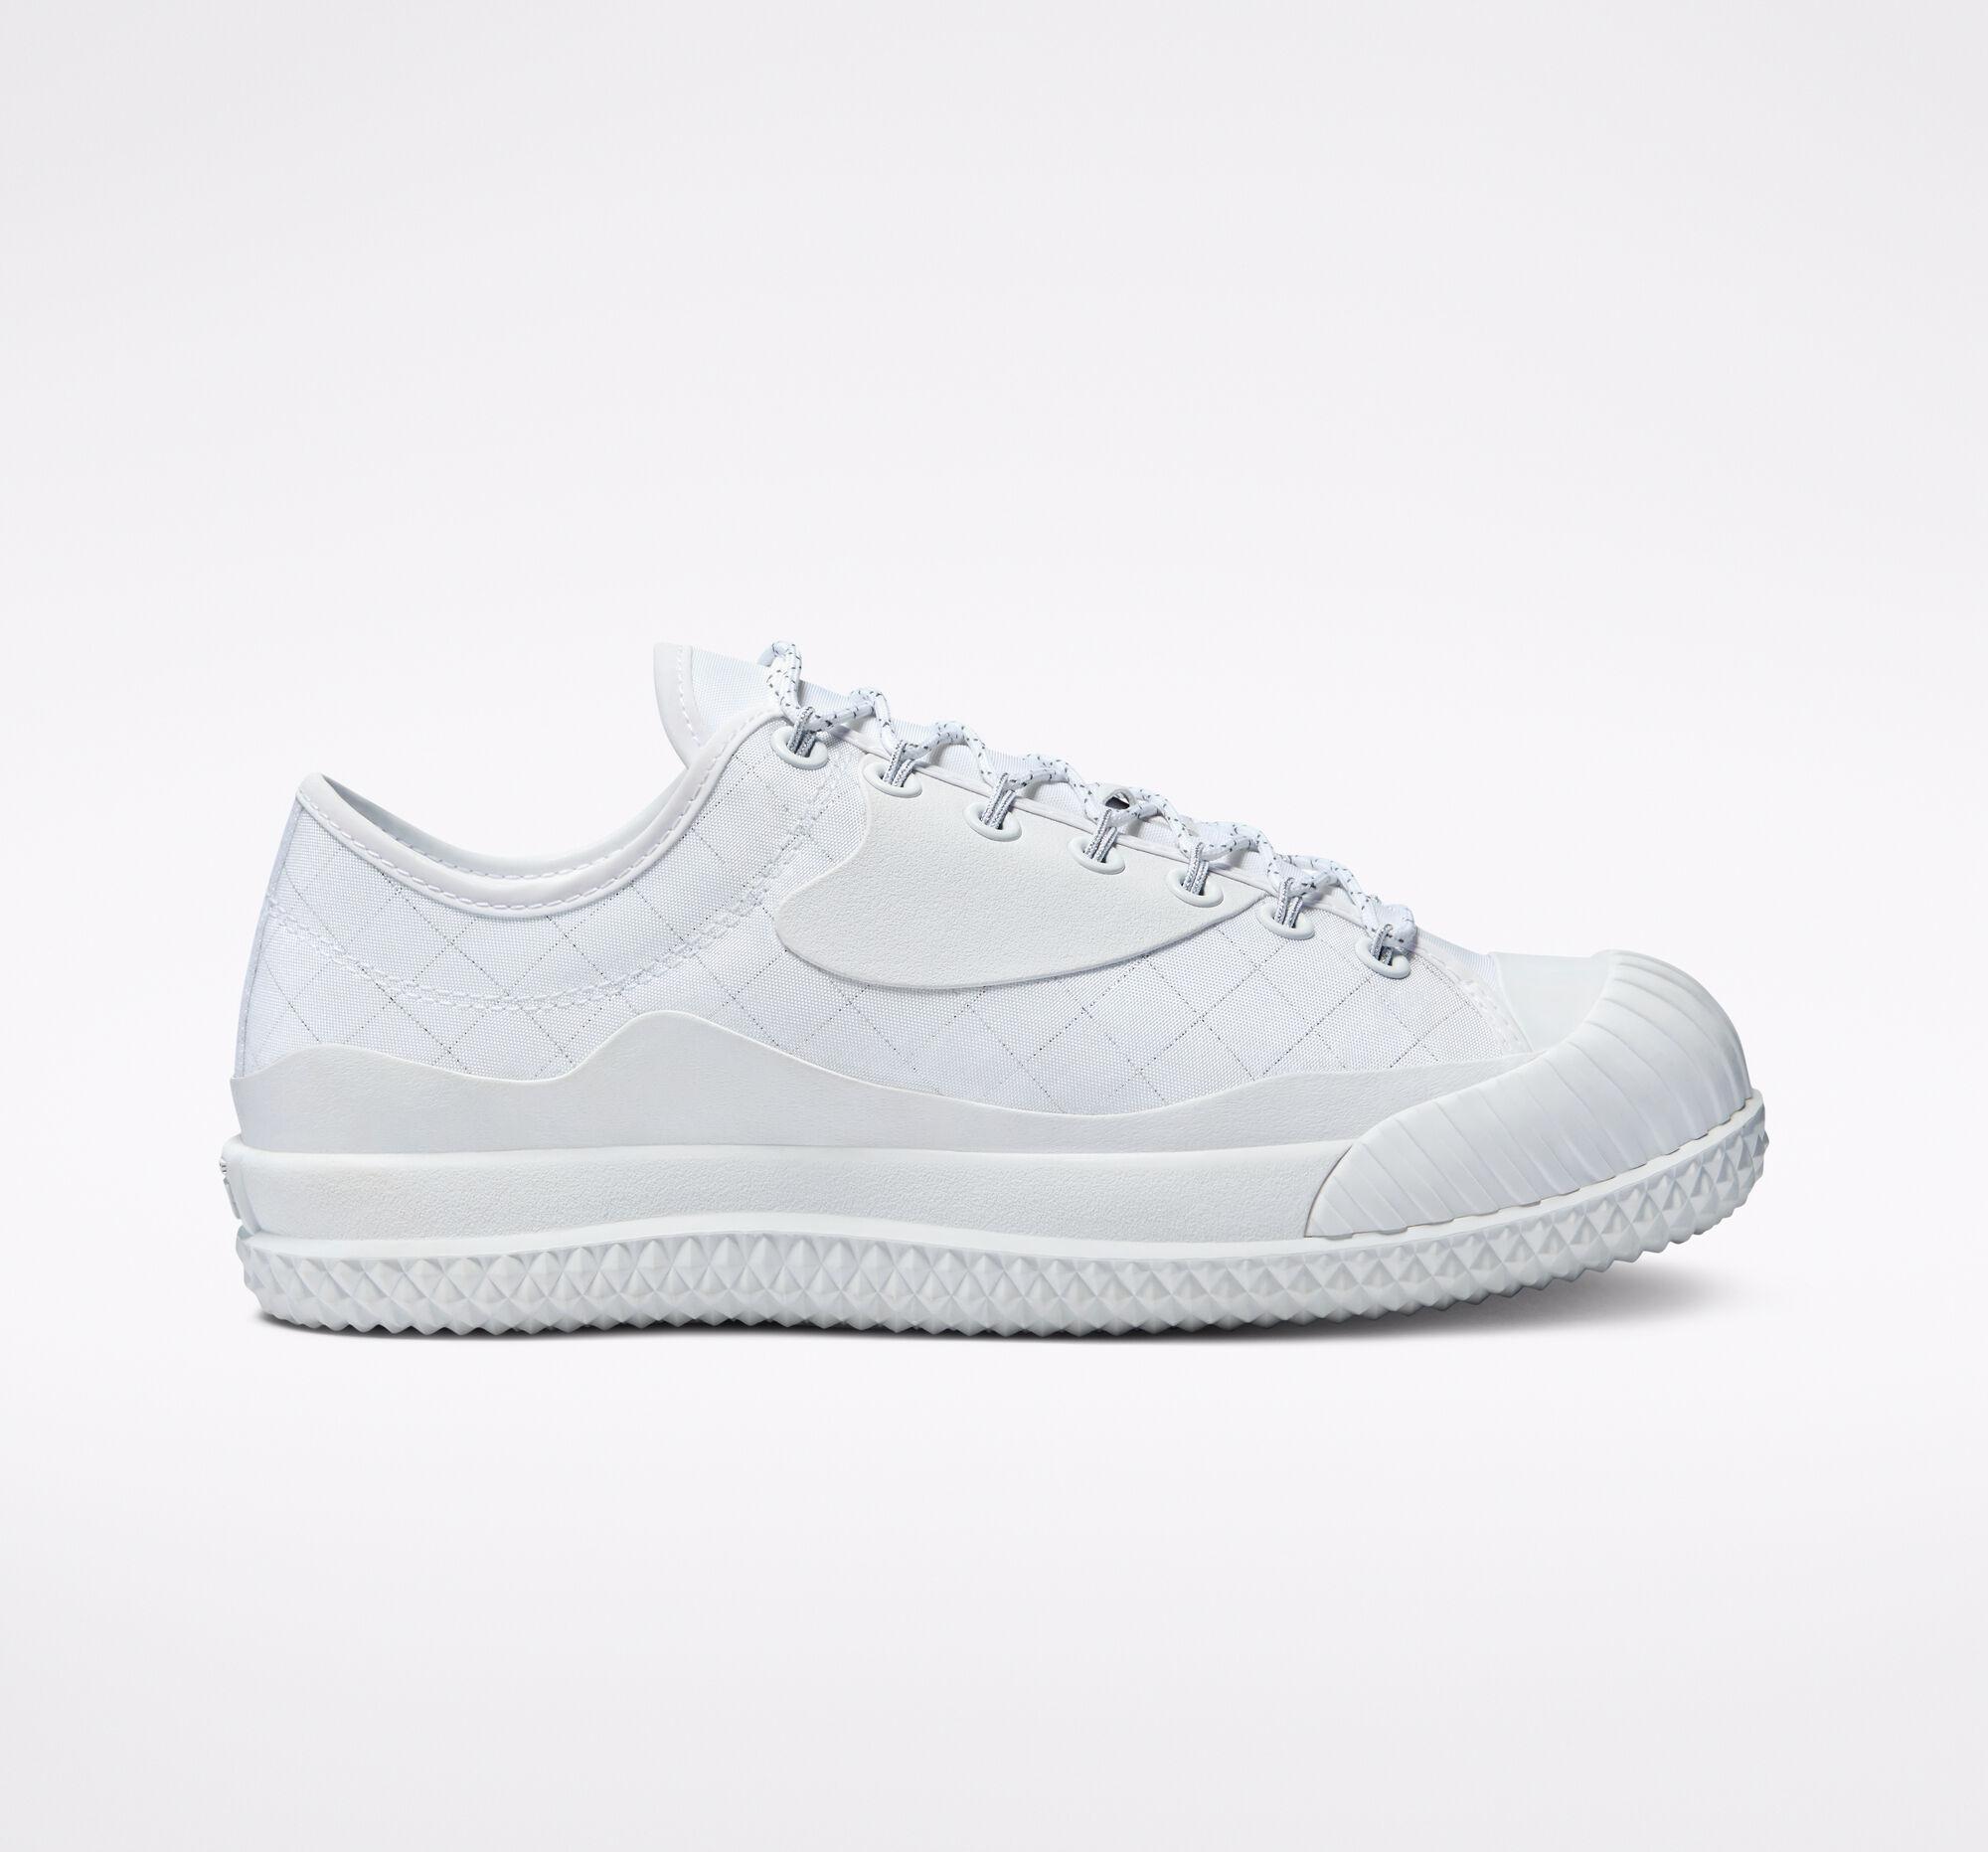 slam-jam-x-converse-bosey-mc-low-white-171224c7